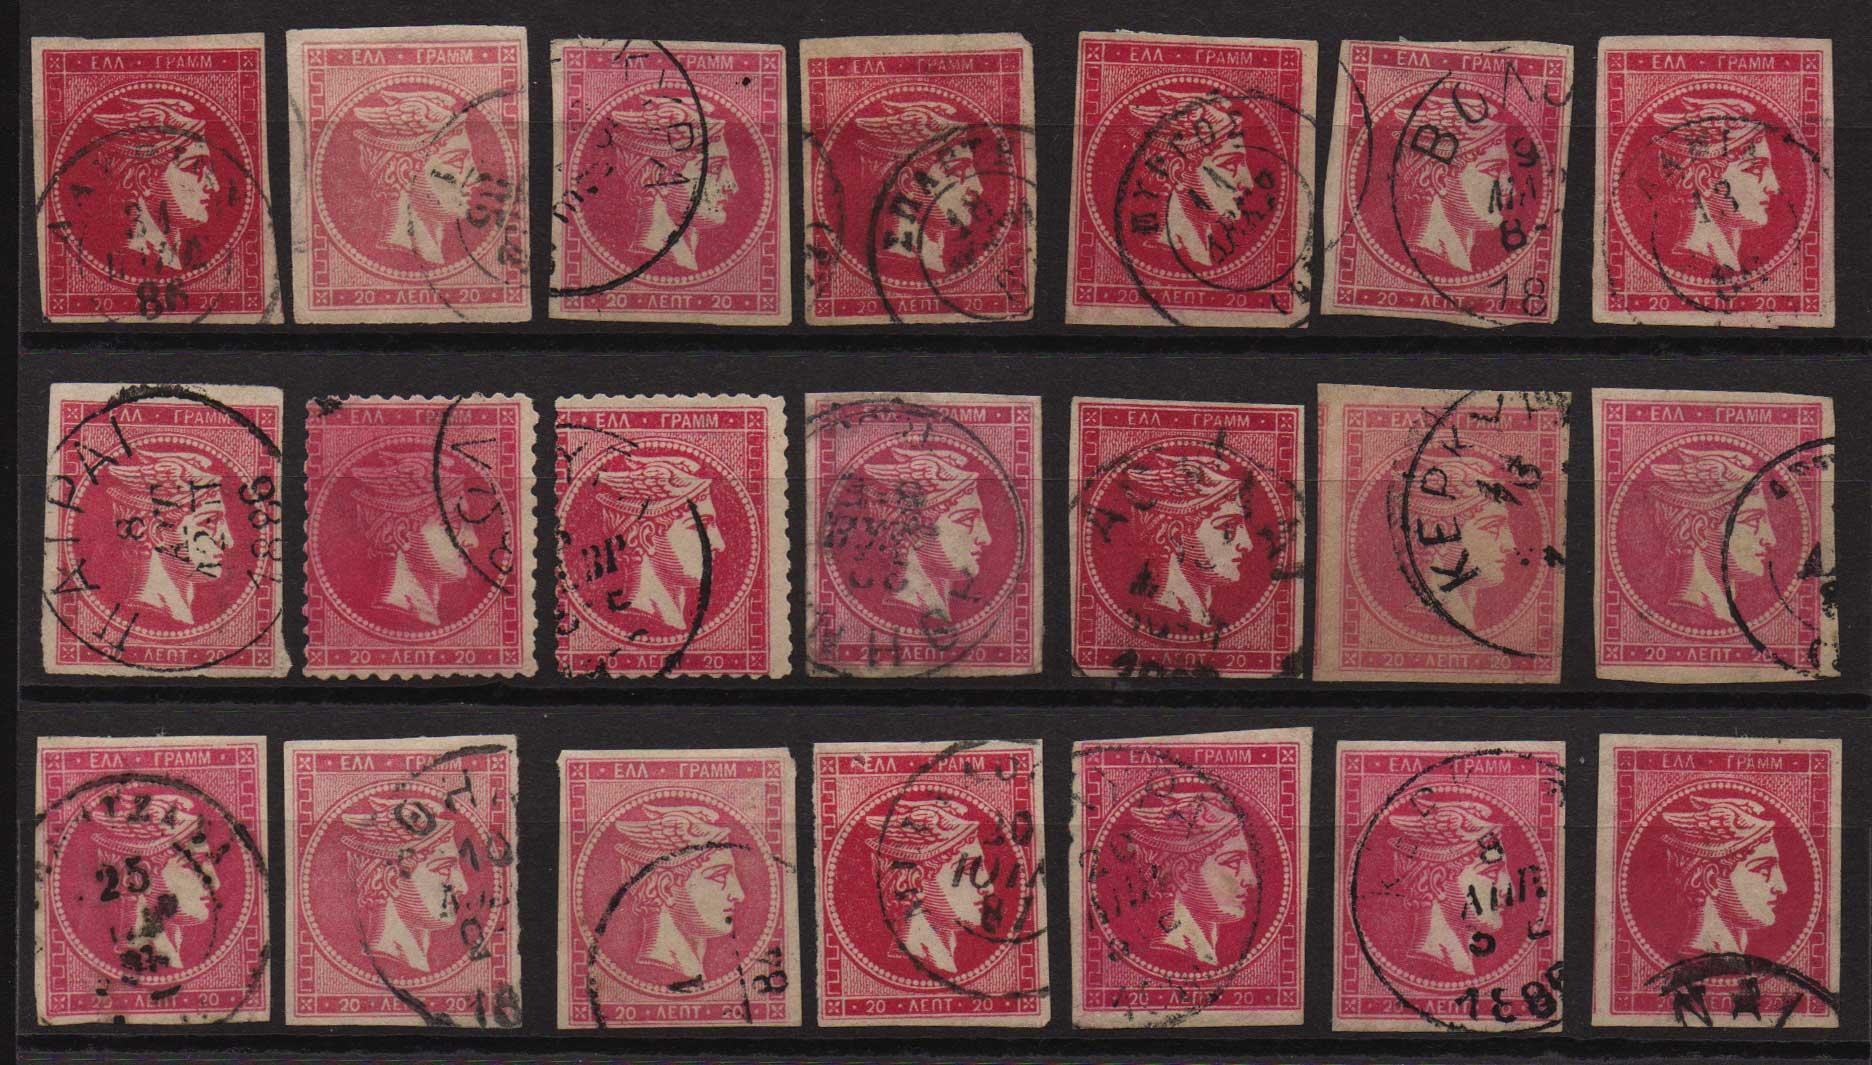 Lot 21 - -  LARGE HERMES HEAD large hermes head -  Athens Auctions Public Auction 69 General Stamp Sale